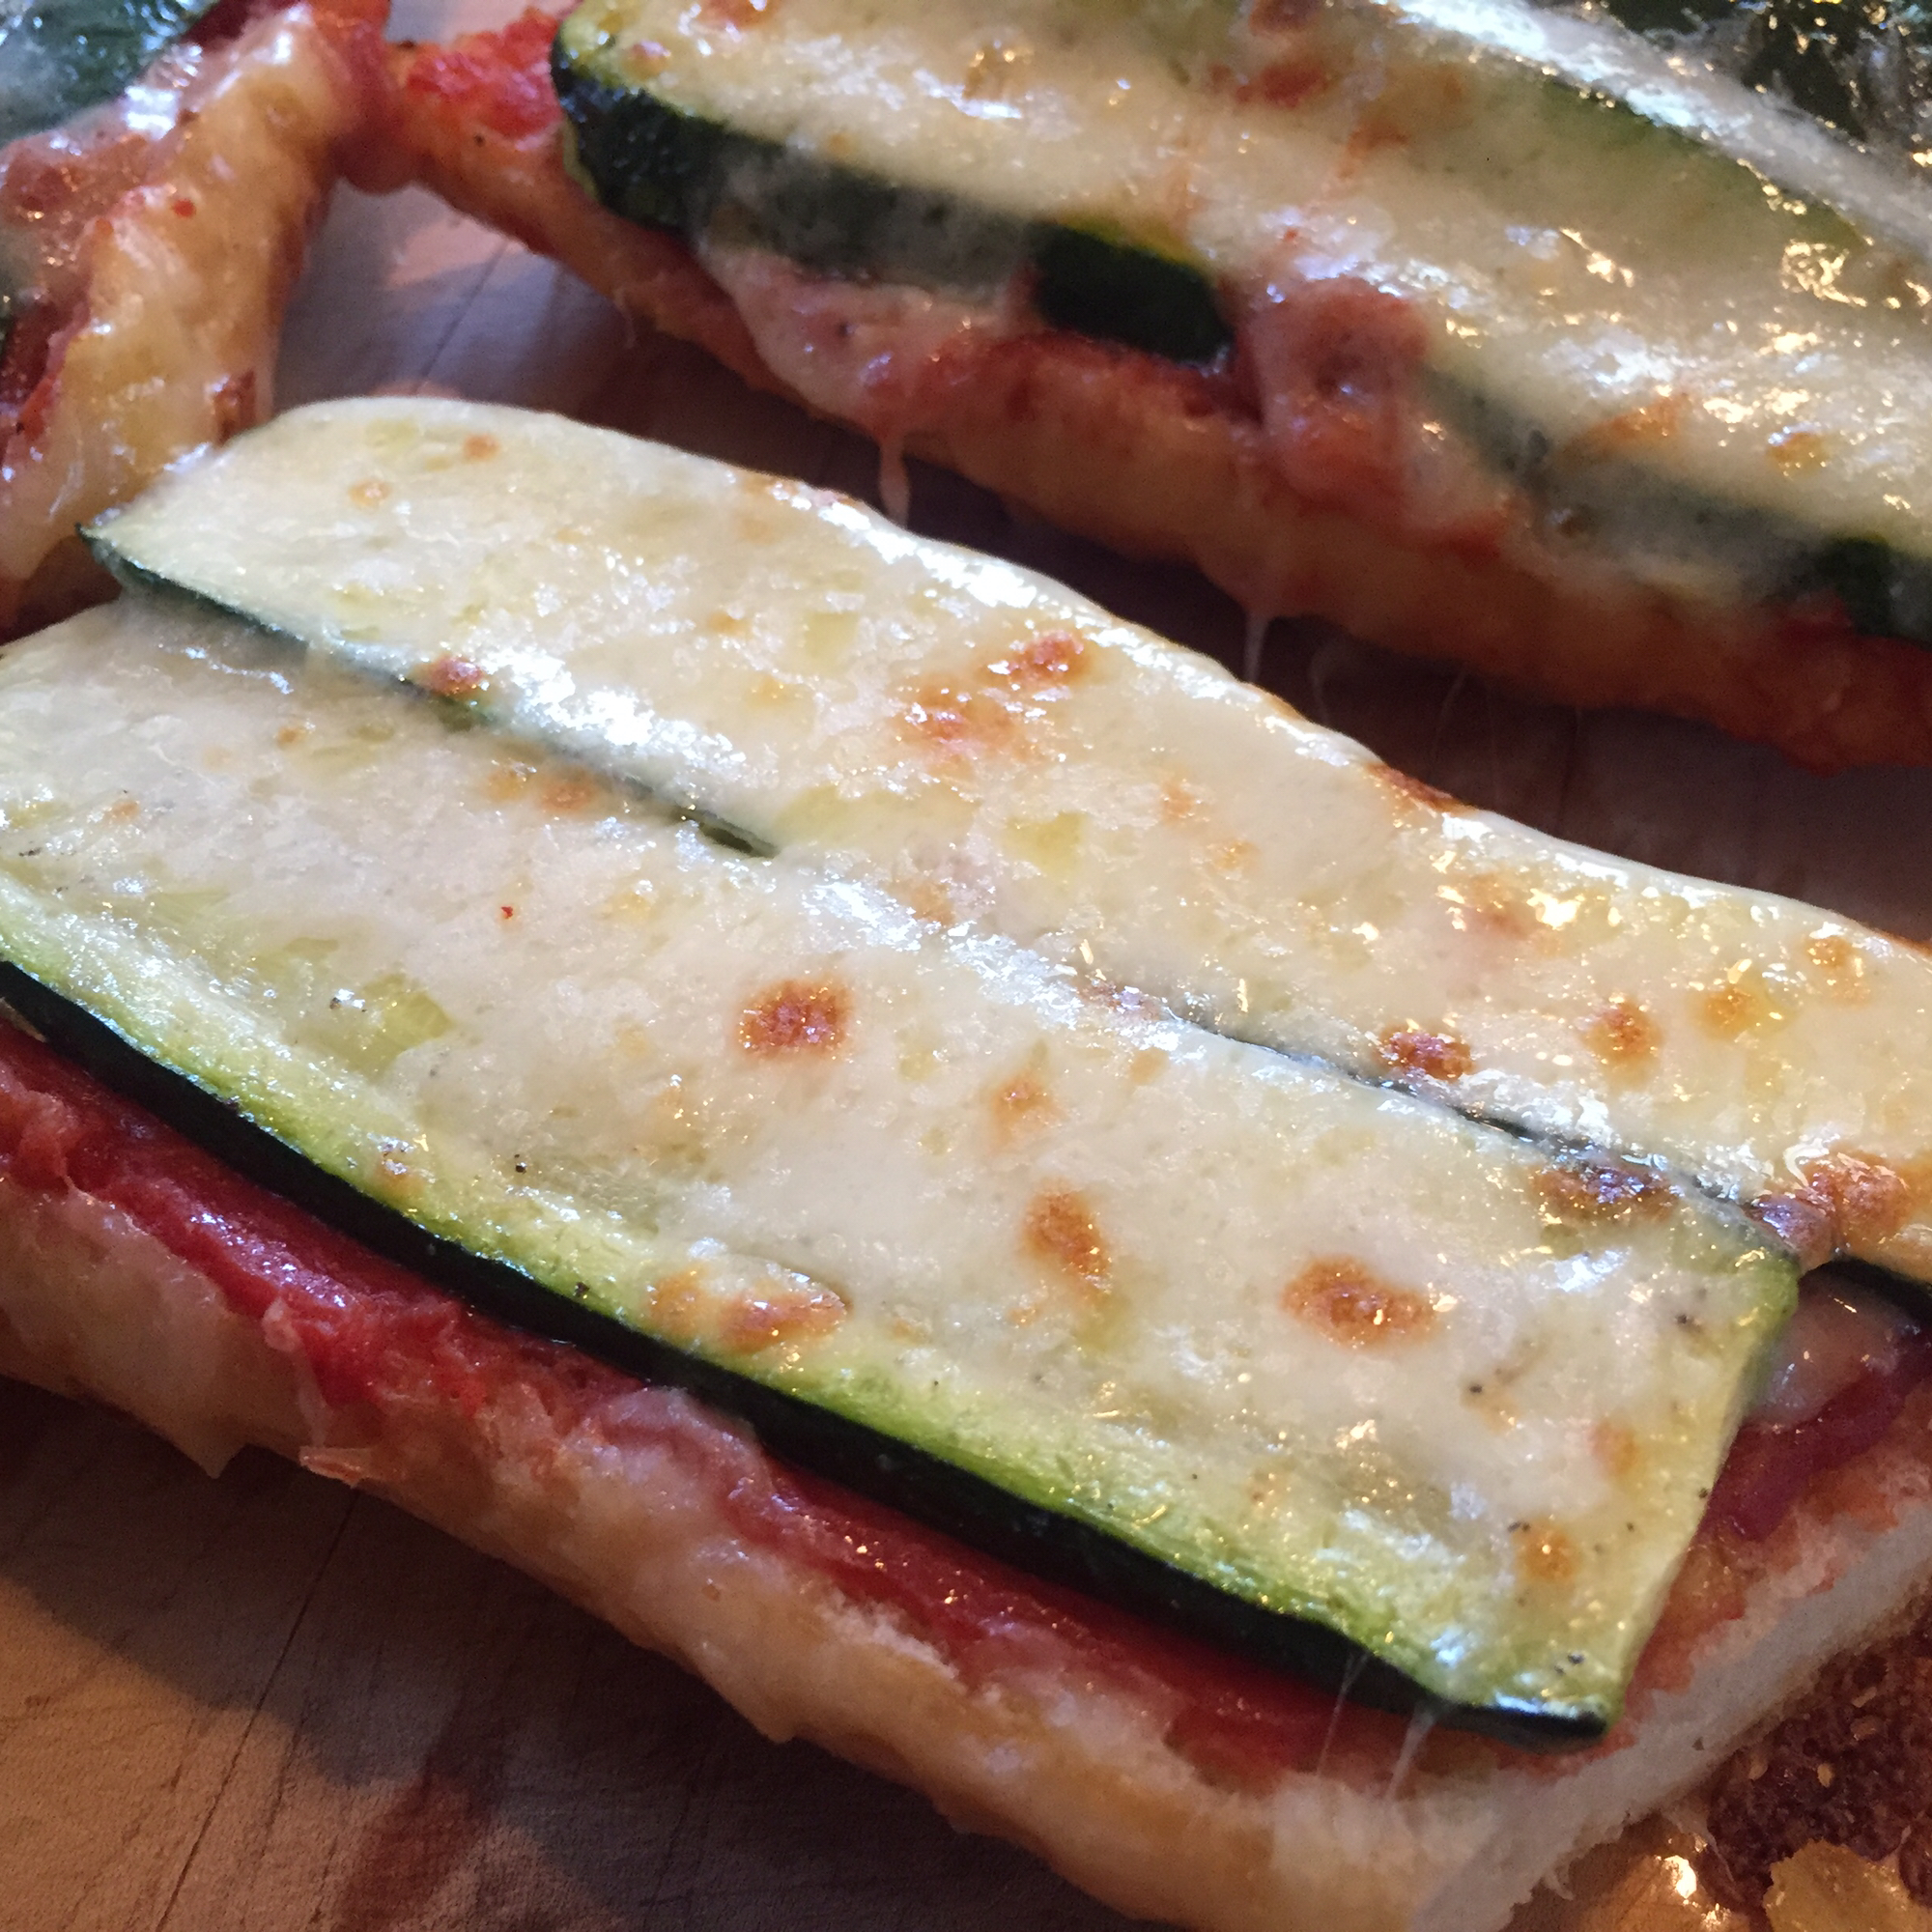 Fabulous Zucchini Grinders vburrito